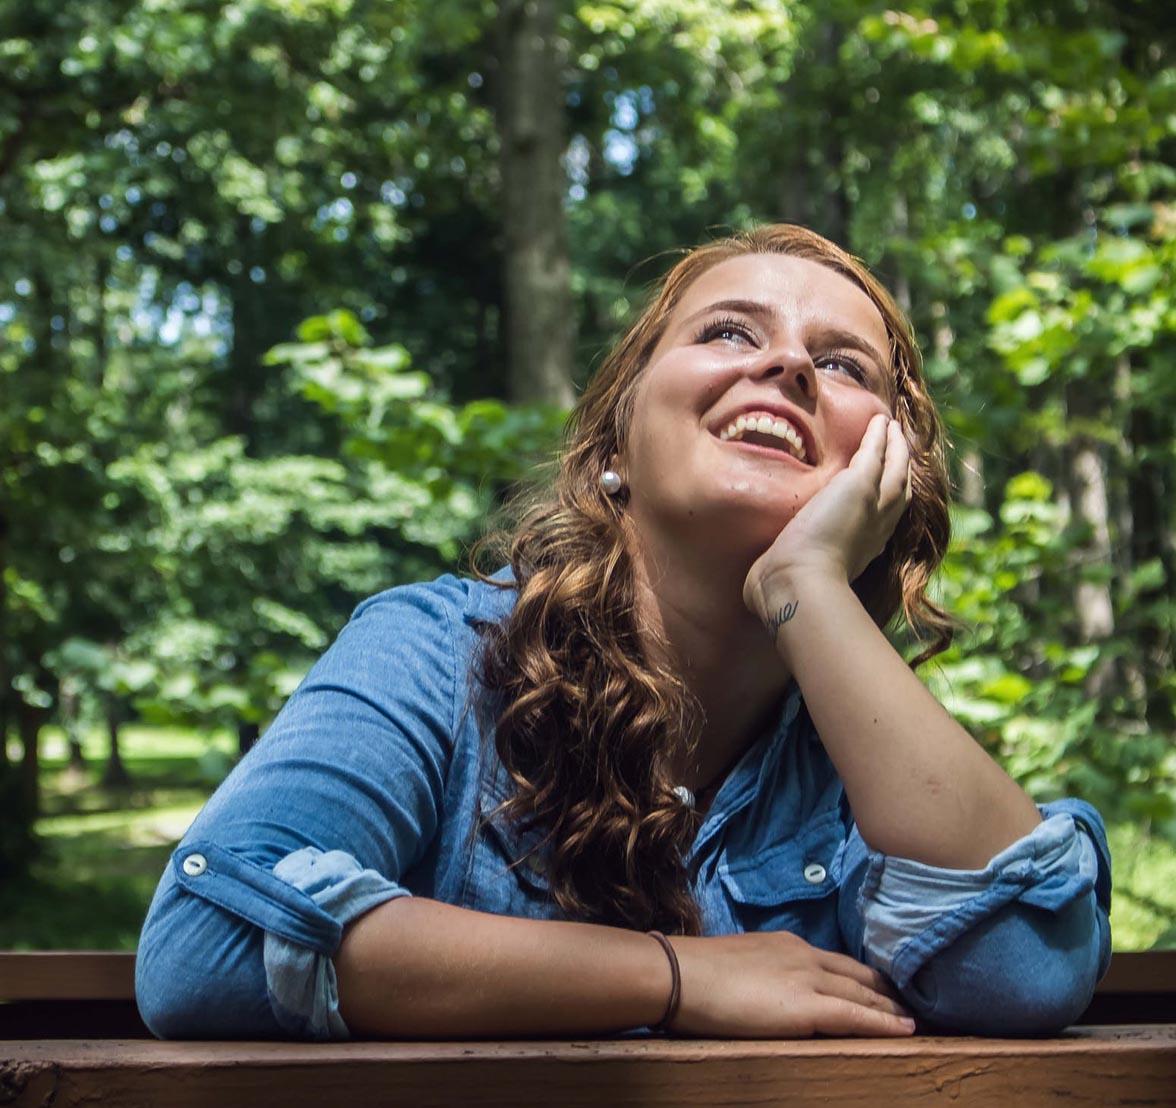 Teenage Woman Smiling